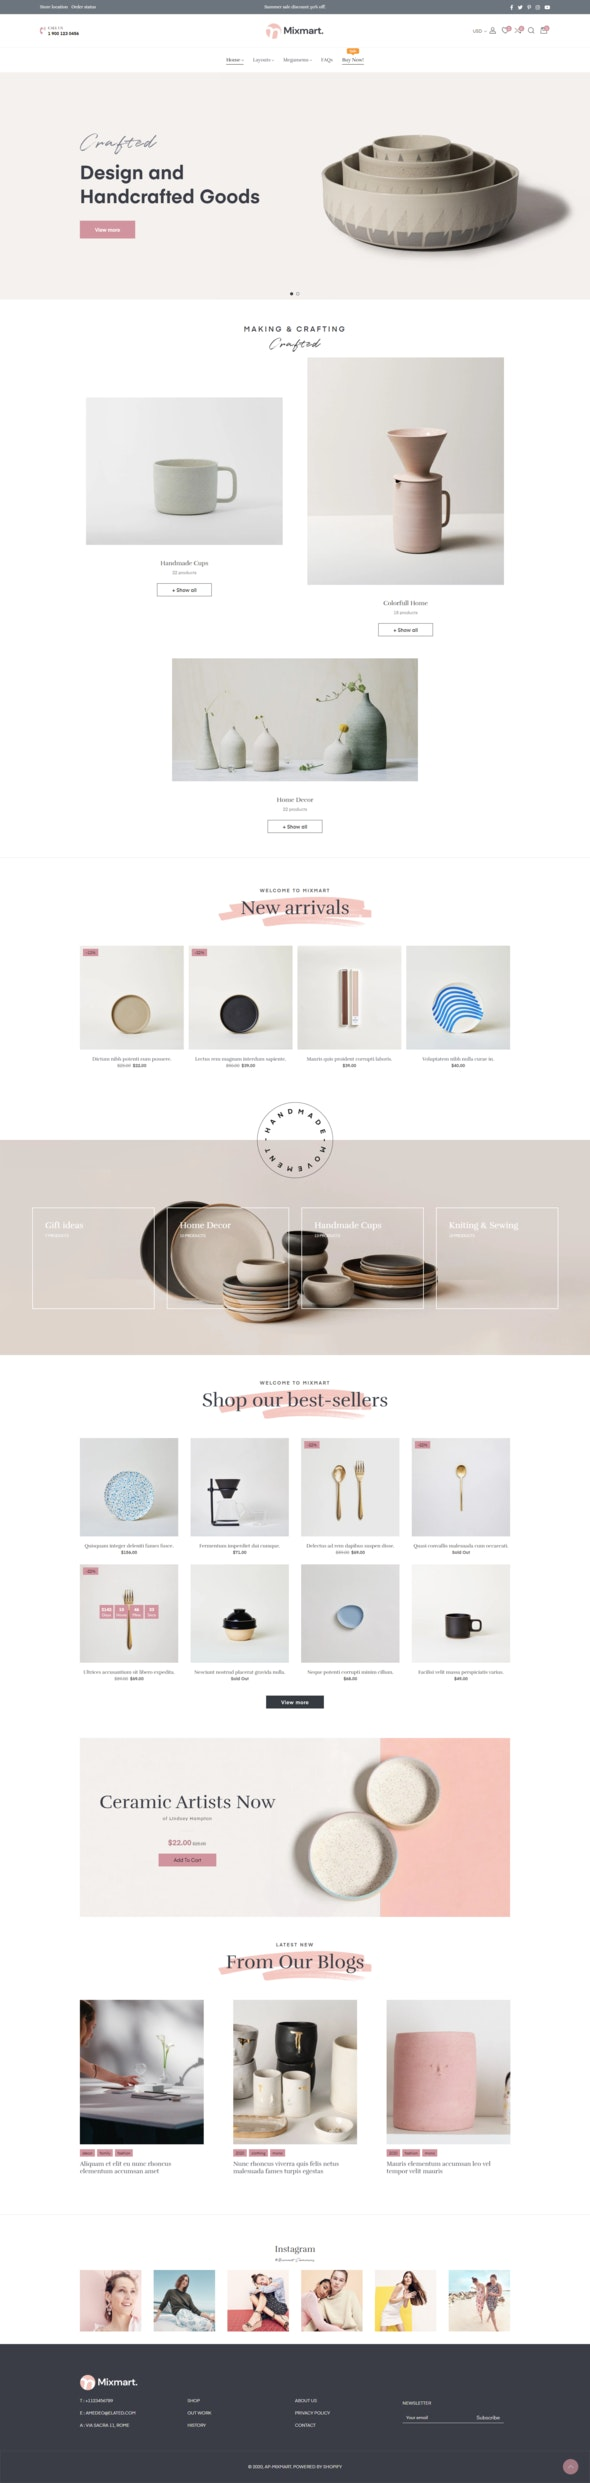 Ap Mixmart - Handmade Shopify Theme - Shopify eCommerce